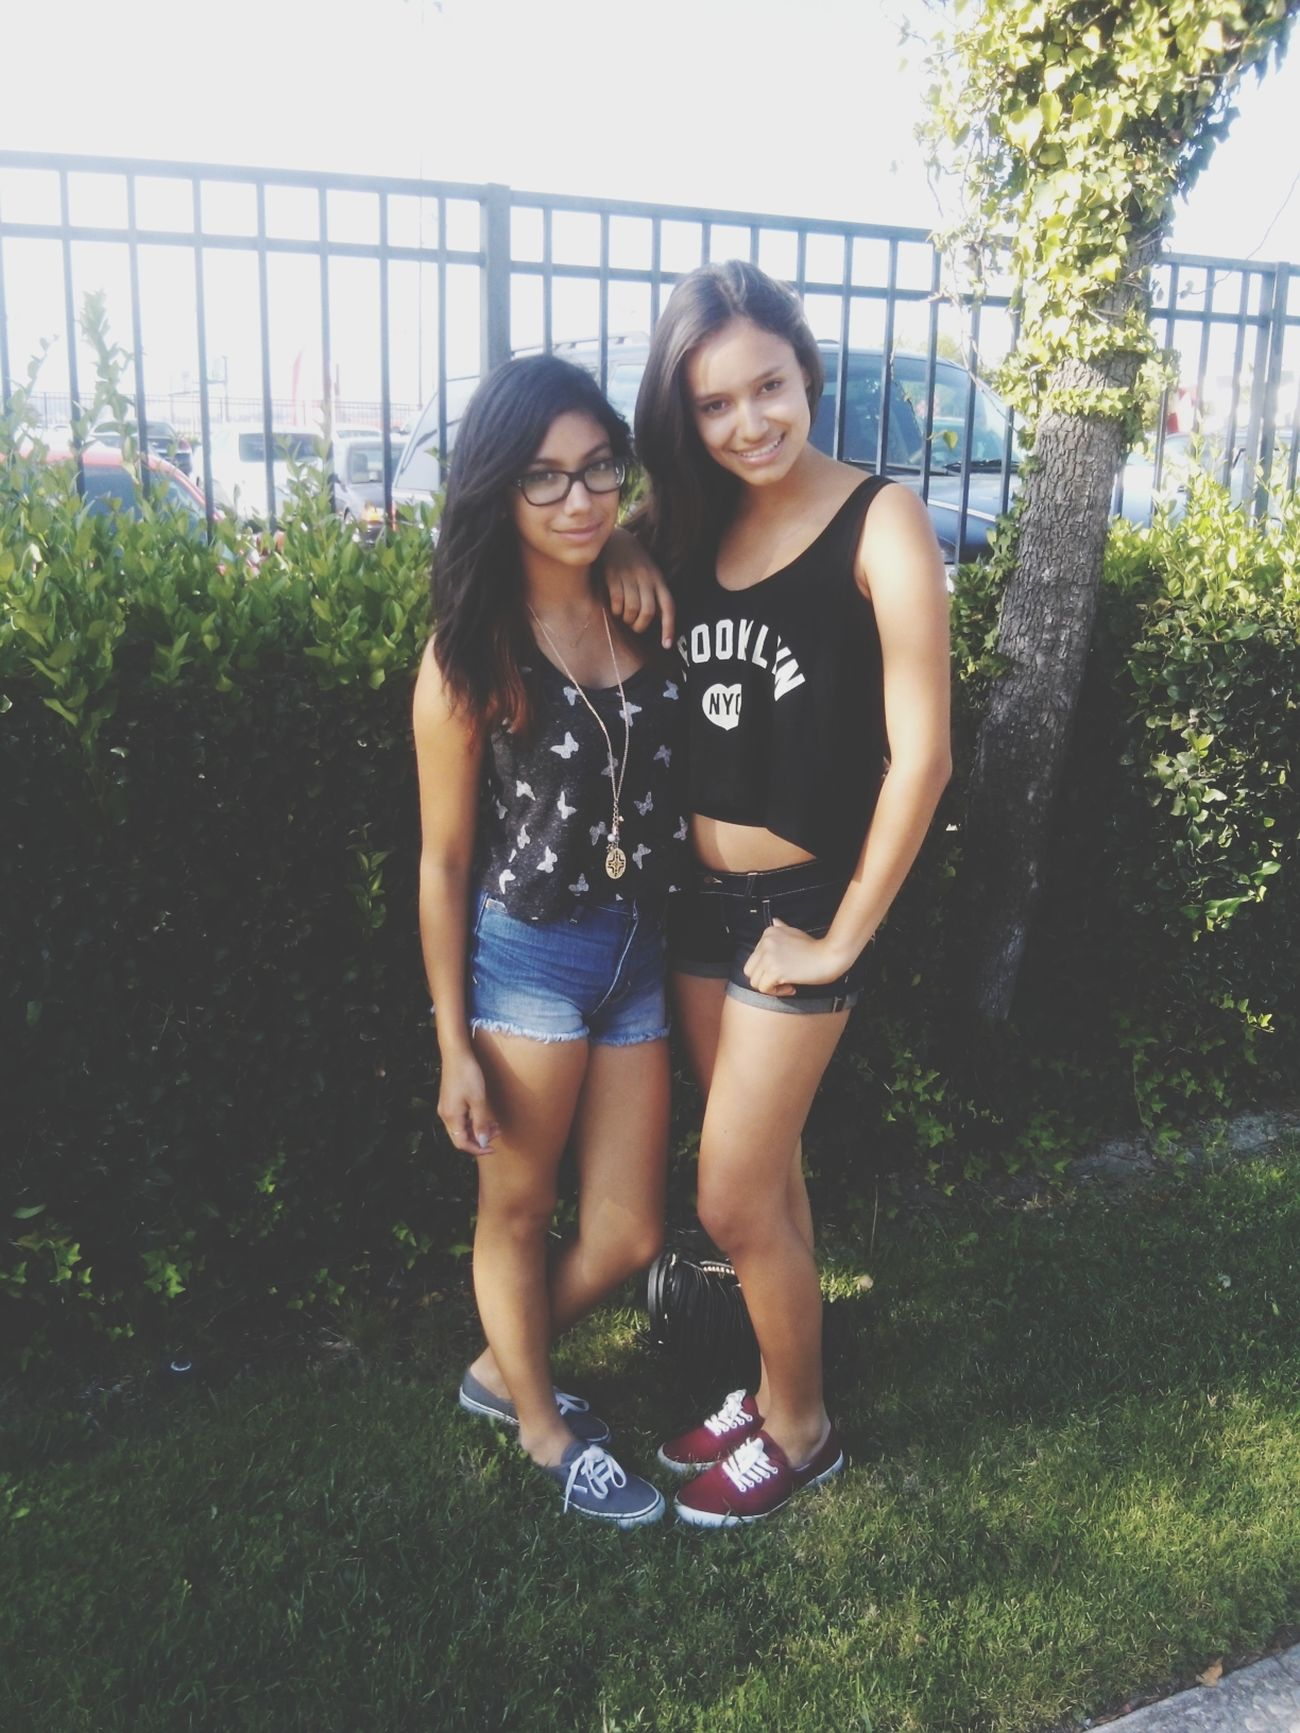 Bonitas♥ Pretty♡ Cousins  Had An Awesome Time At Speedzone^.^